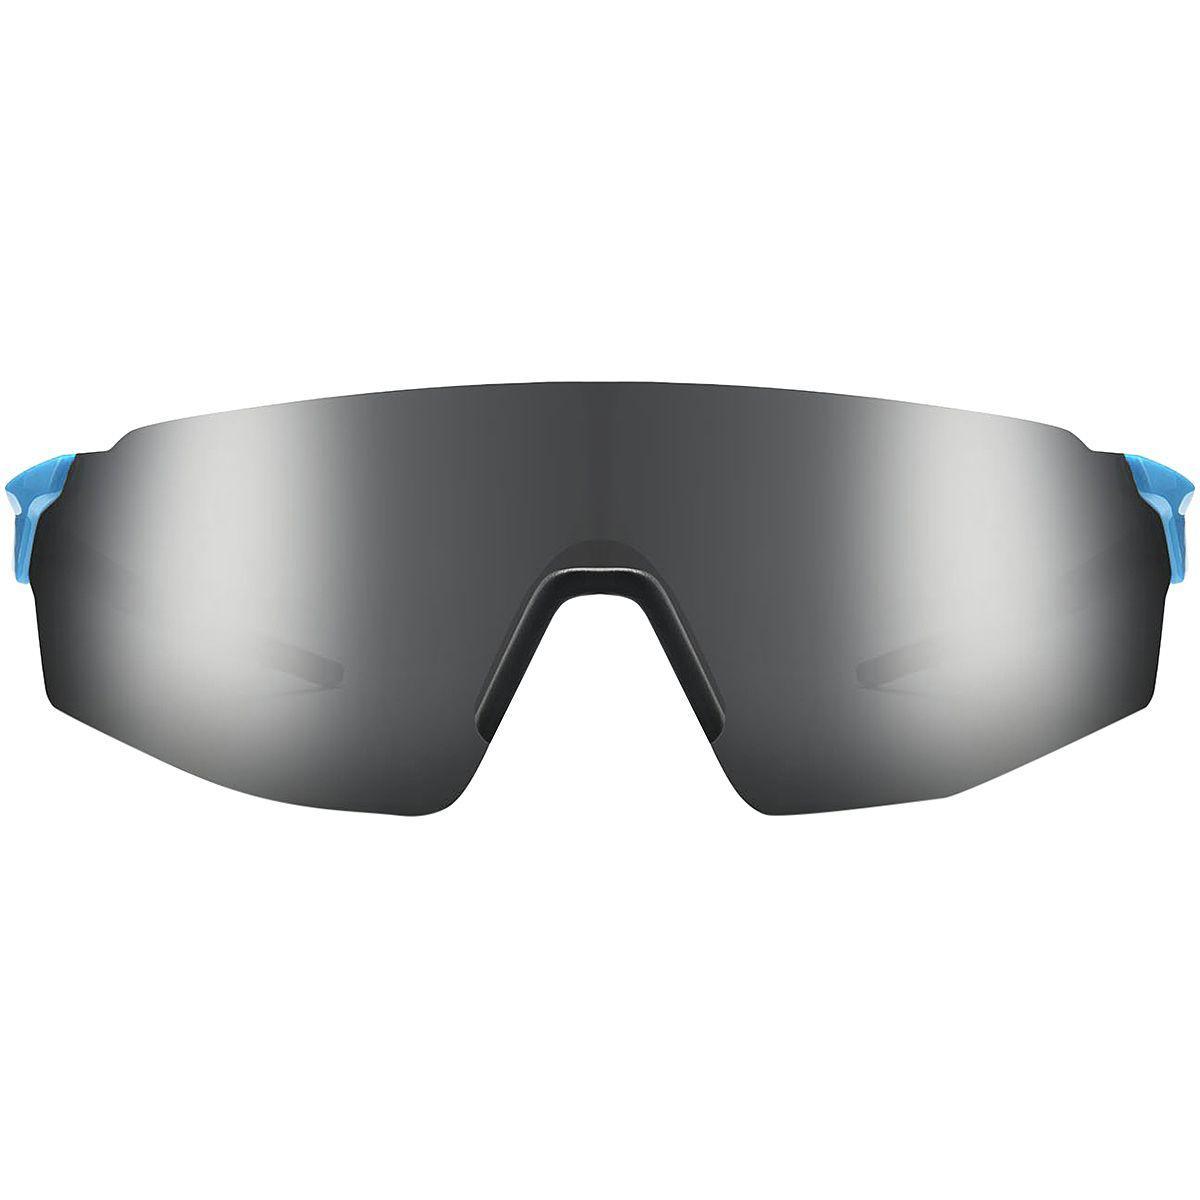 081003d0930 Lyst - Roka Apex Sl-1 Sunglasses in Gray for Men